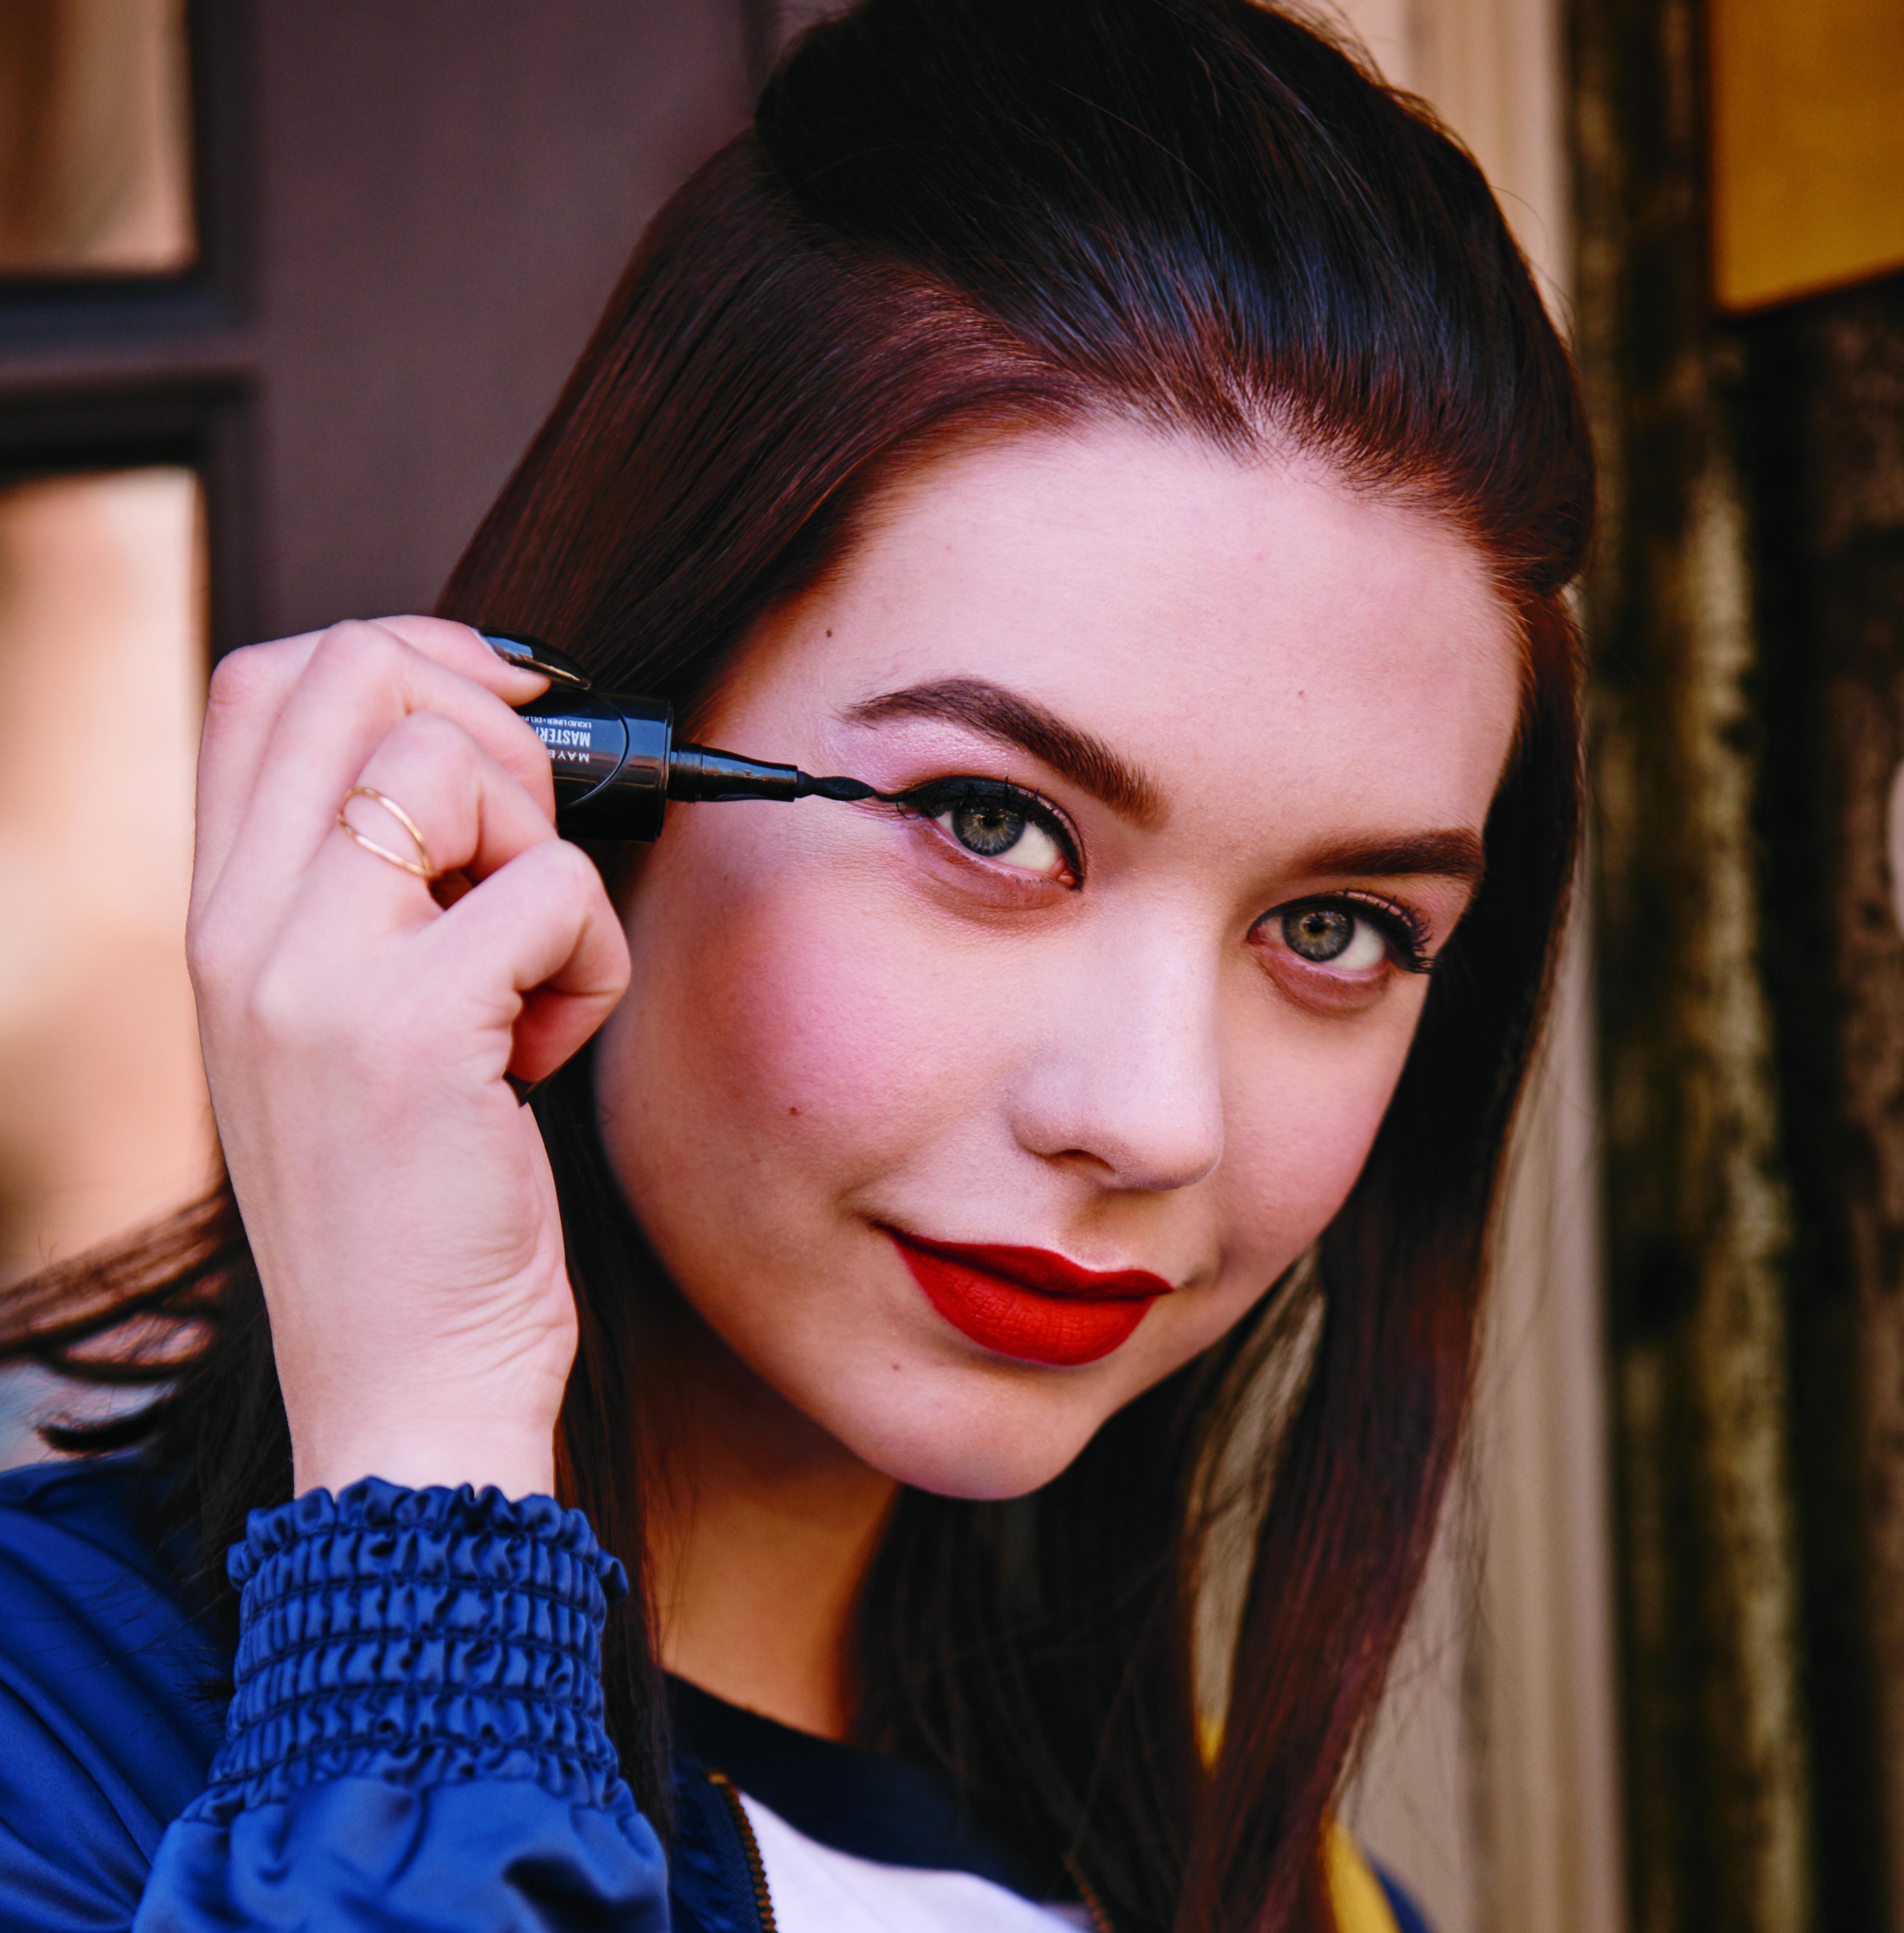 Winged eyeliner is always a classic makeup look. Amanda